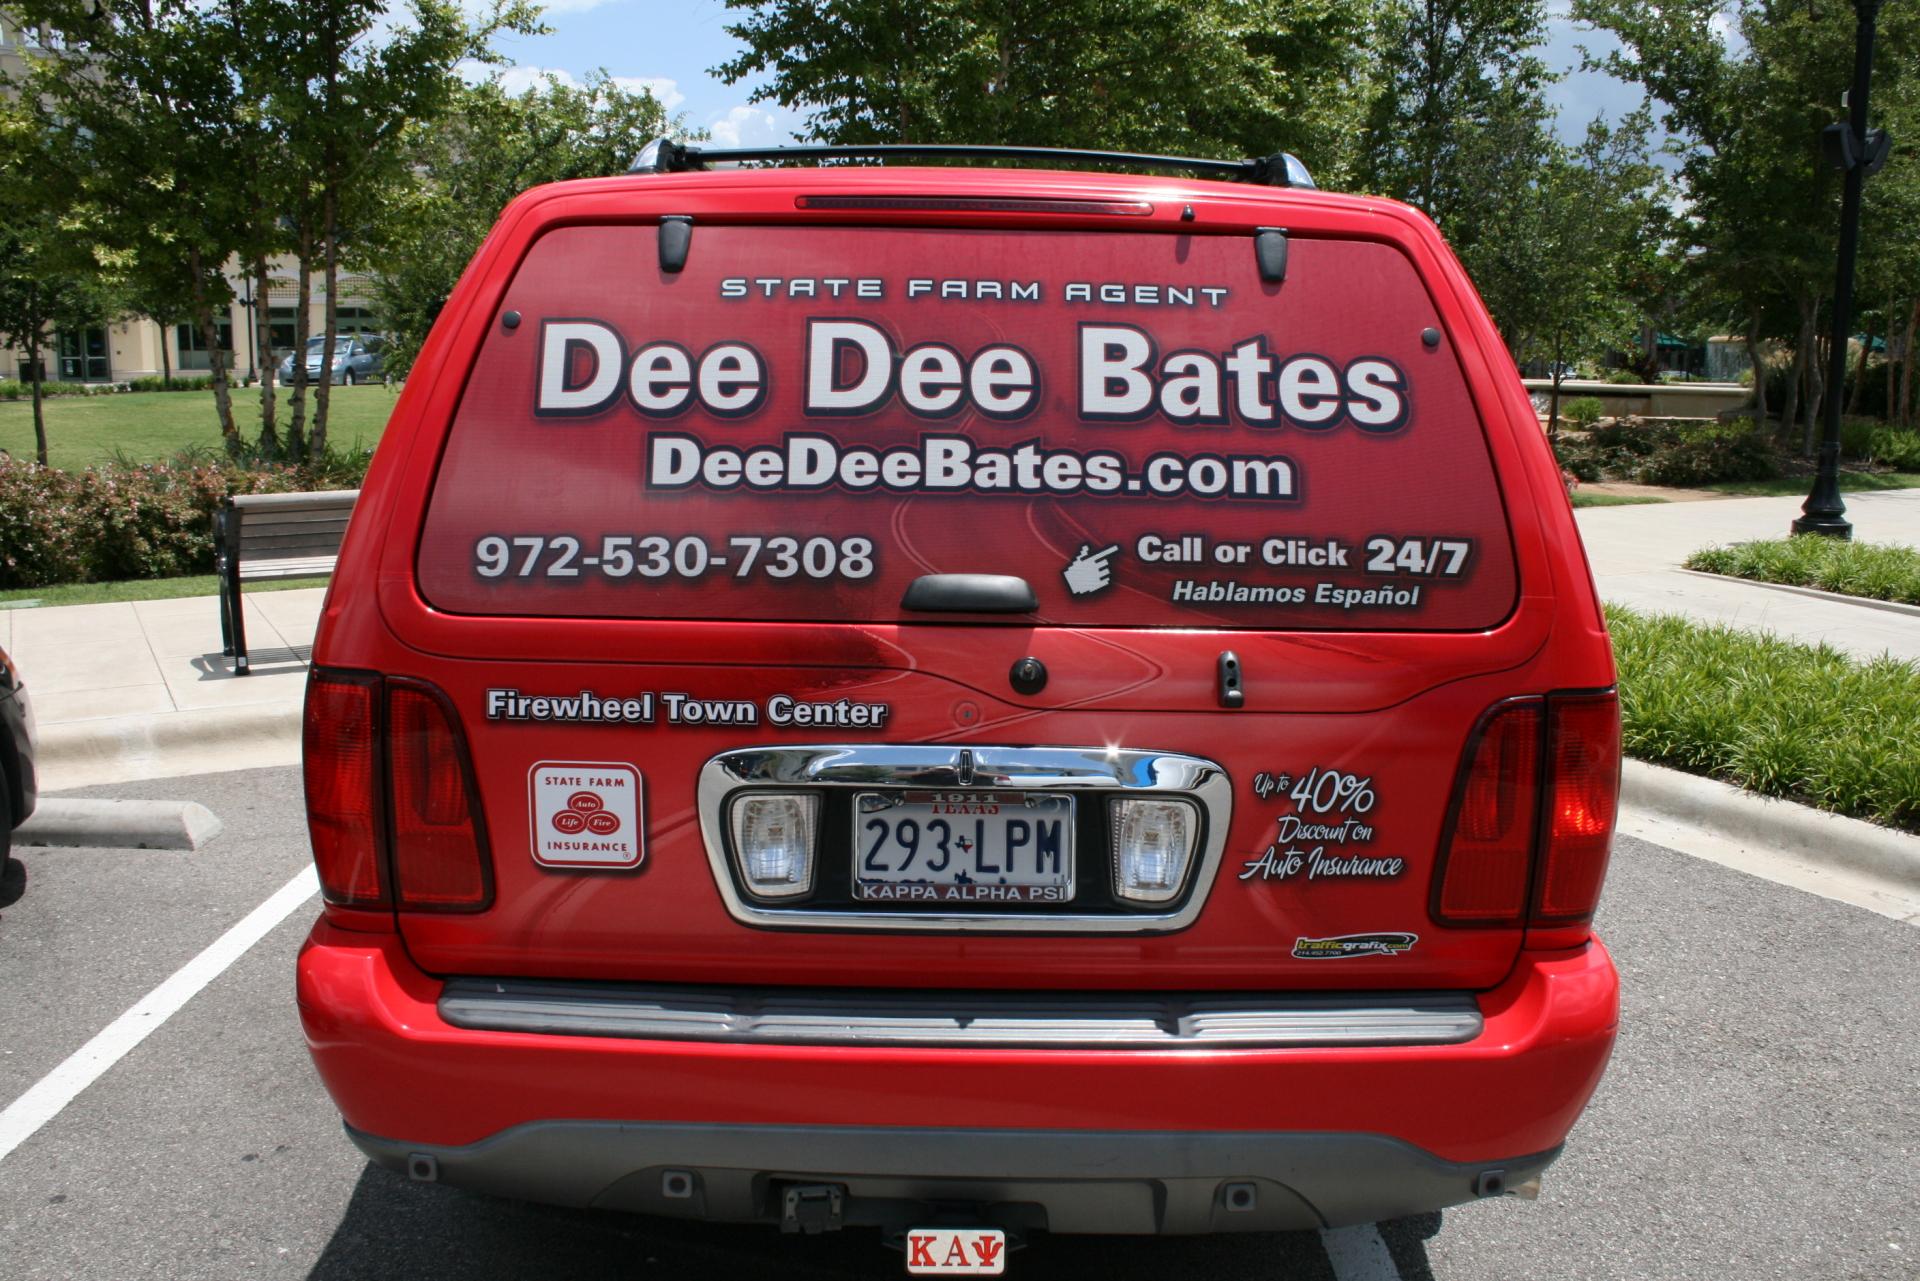 State Farm Agent Dee Dee Bates, State Farm Vehicle wraps, vehicle wrap dallas tx